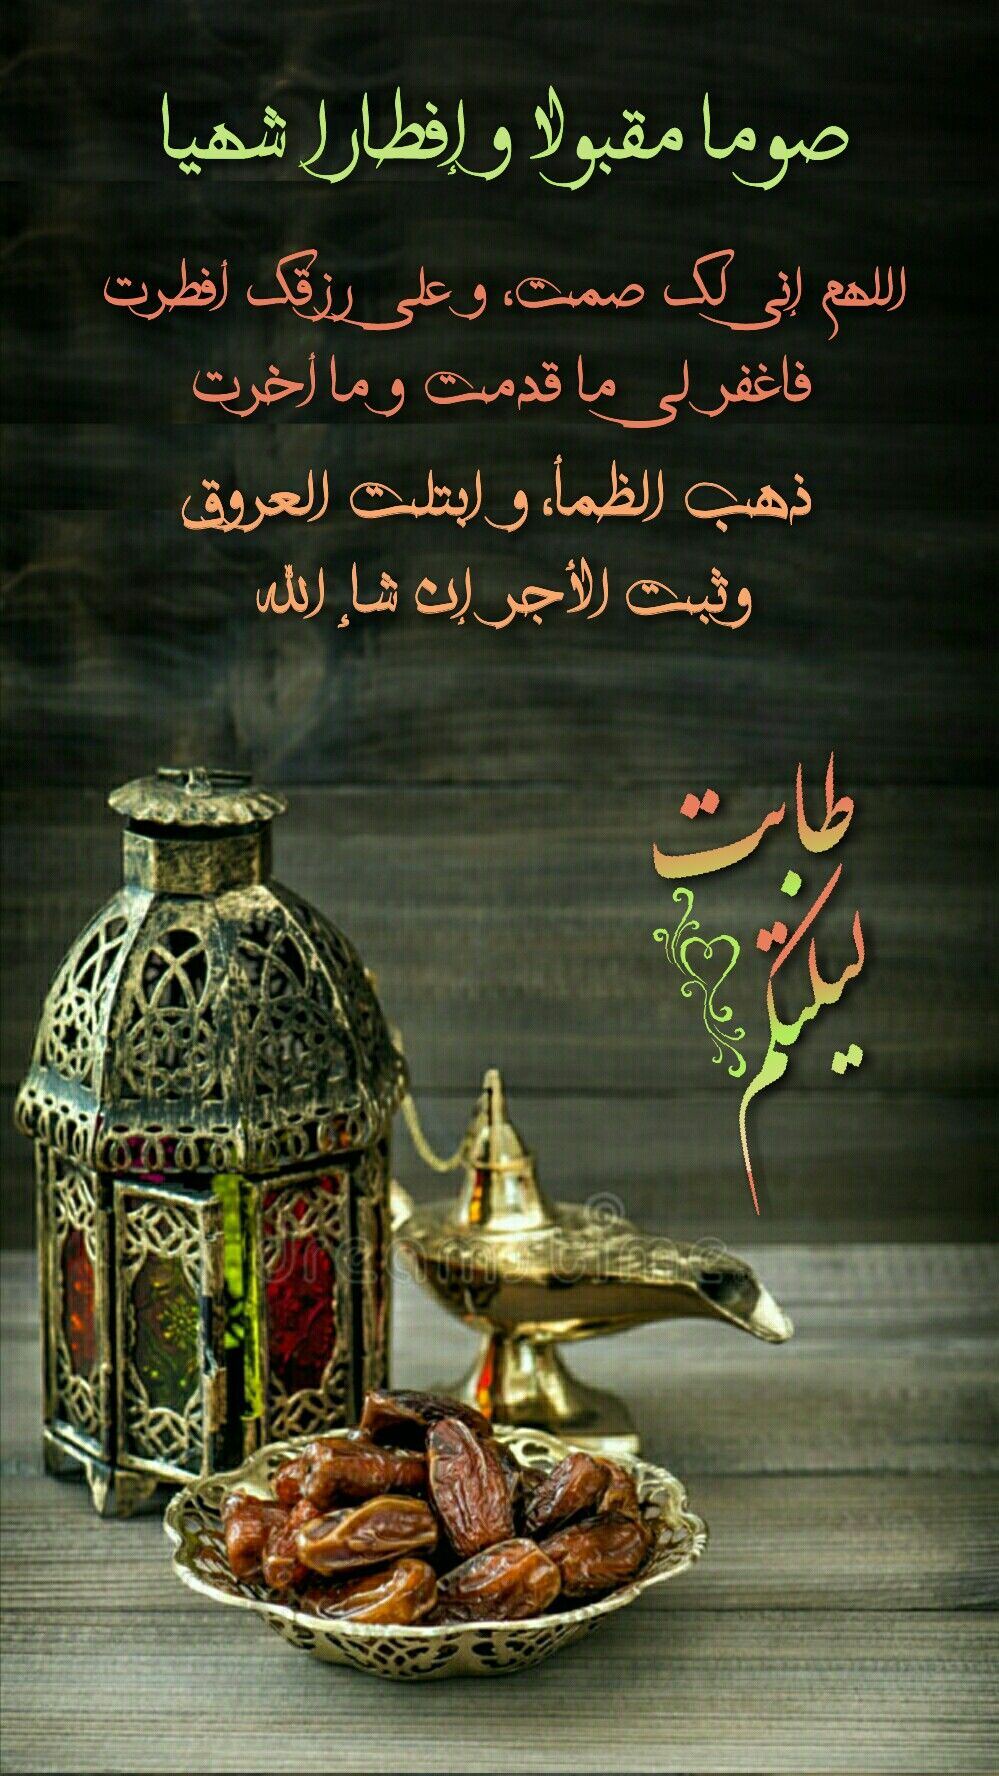 Pin By Y Mostafa On صباح الخير Ramadan Greetings Ramadan Ramadan Kareem